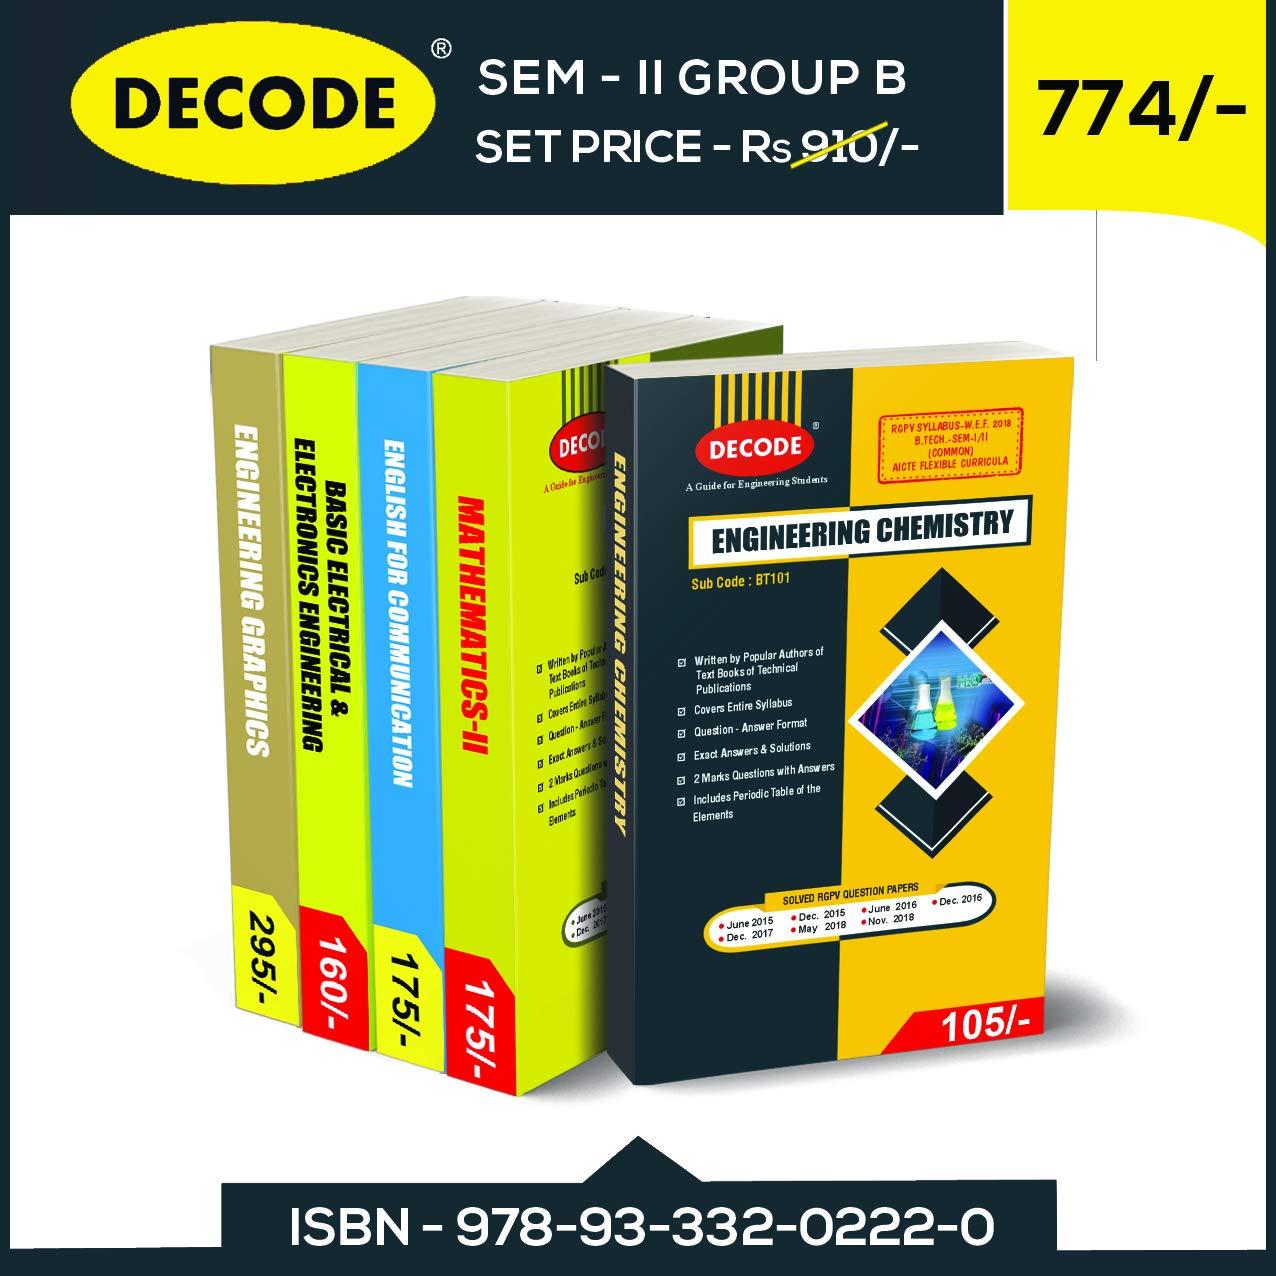 Buy DECODE SEM-II Group B for RGPV 2018 Syllabus Book Online